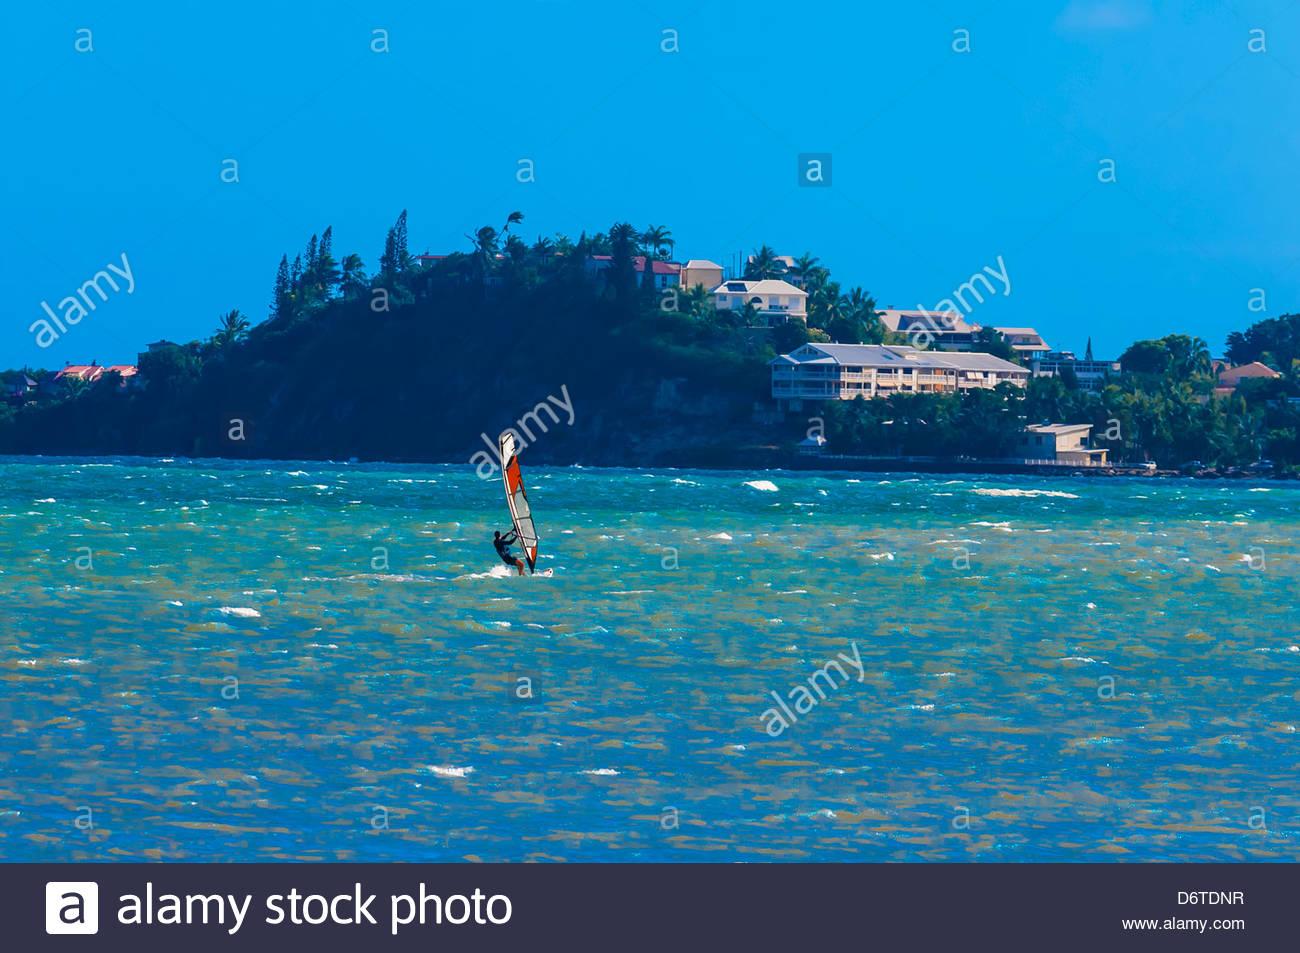 Windsurfing, Magenta Bay (Baie de Magenta), Noumea, New Caledonia - Stock Image